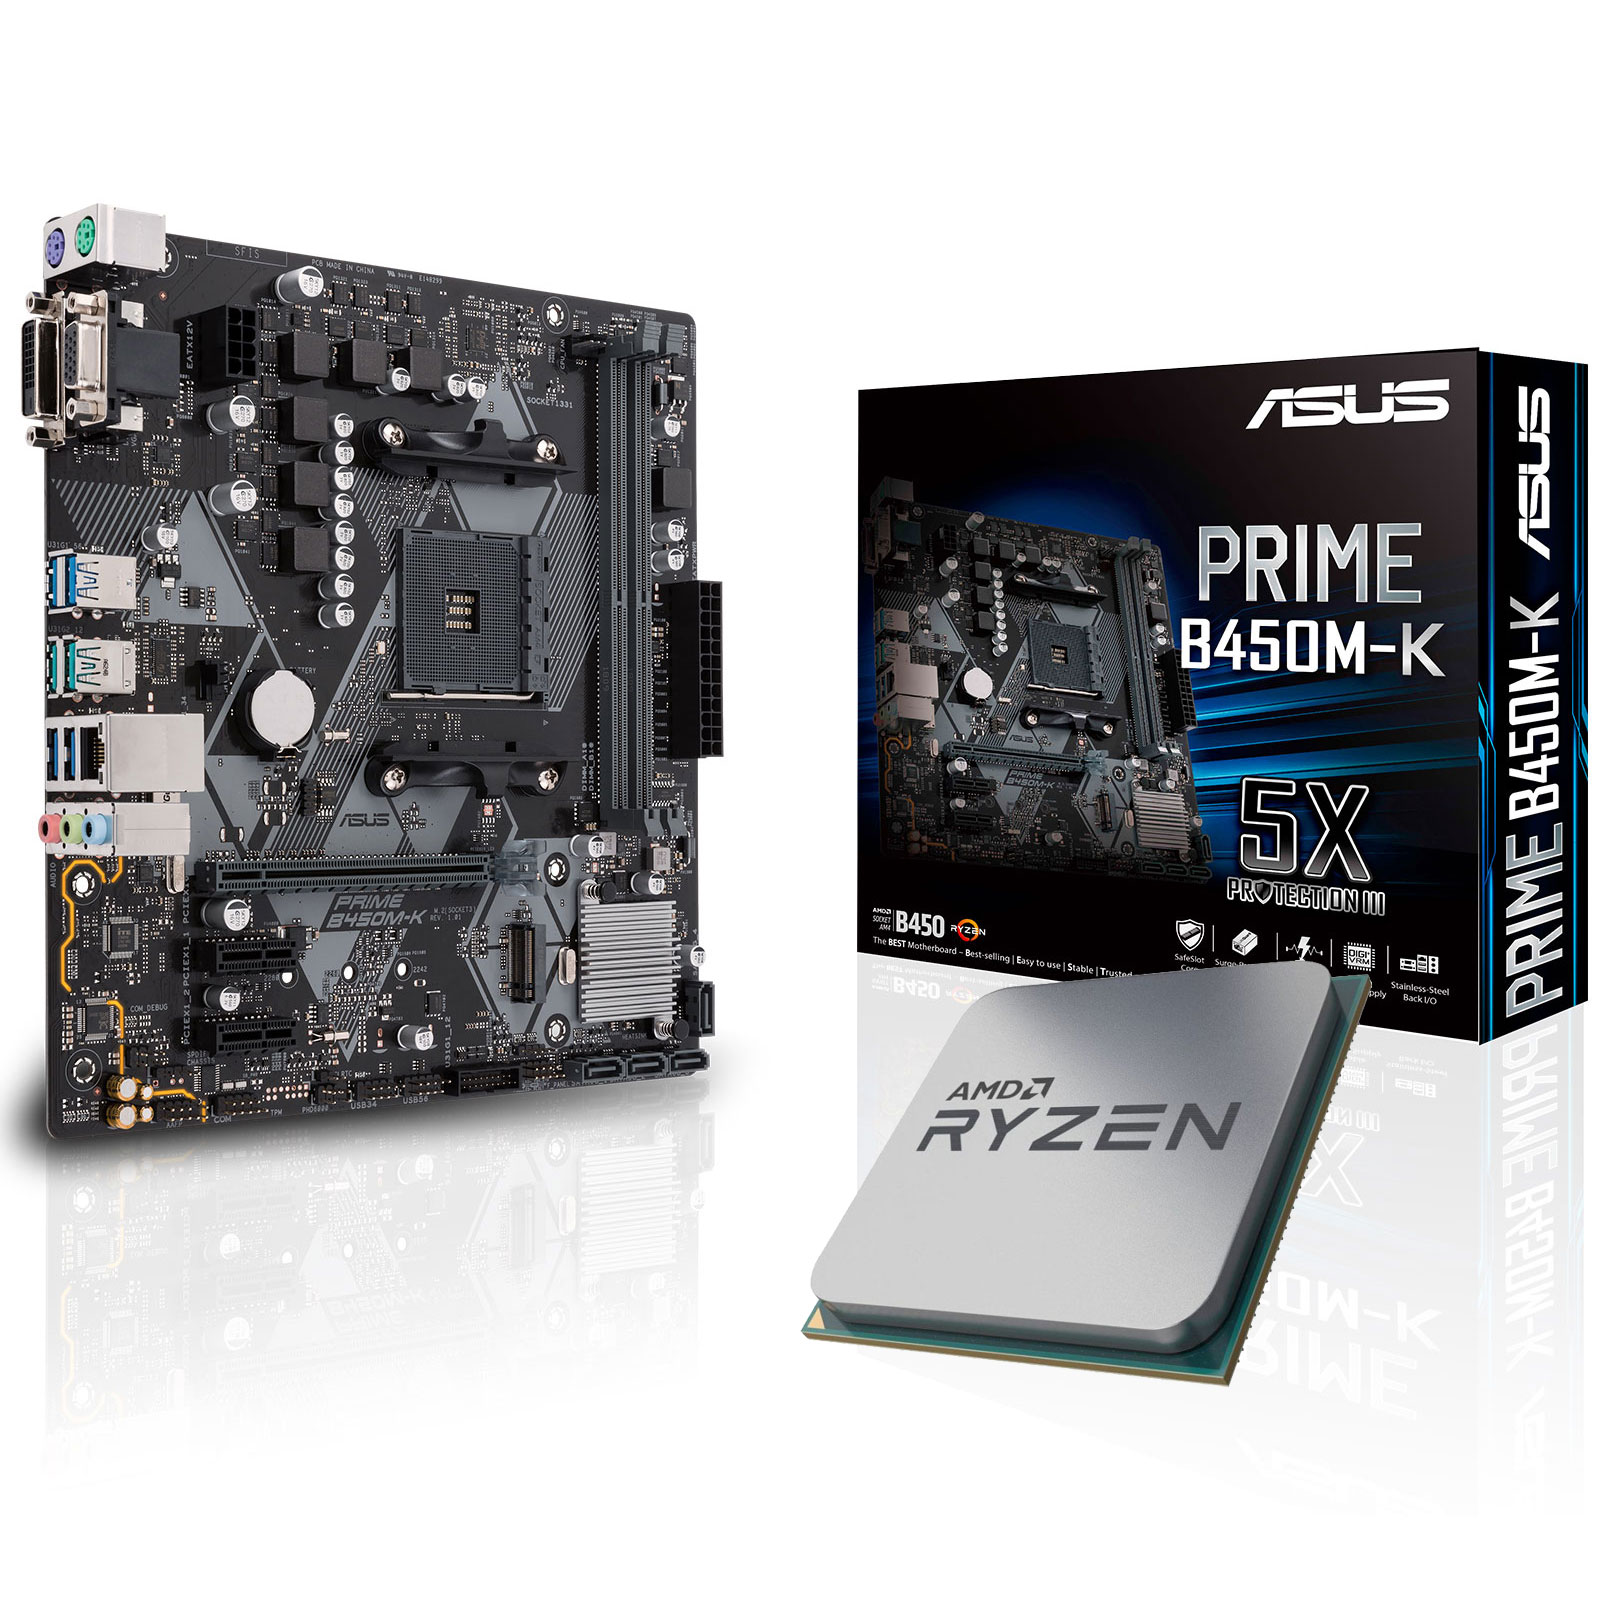 Kit upgrade PC Kit Upgrade PC AMD Ryzen 5 2600X ASUS PRIME B450M-K Carte mère Micro ATX Socket AM4 AMD B450 + CPU AMD Ryzen 5 2600X (3.6 GHz)